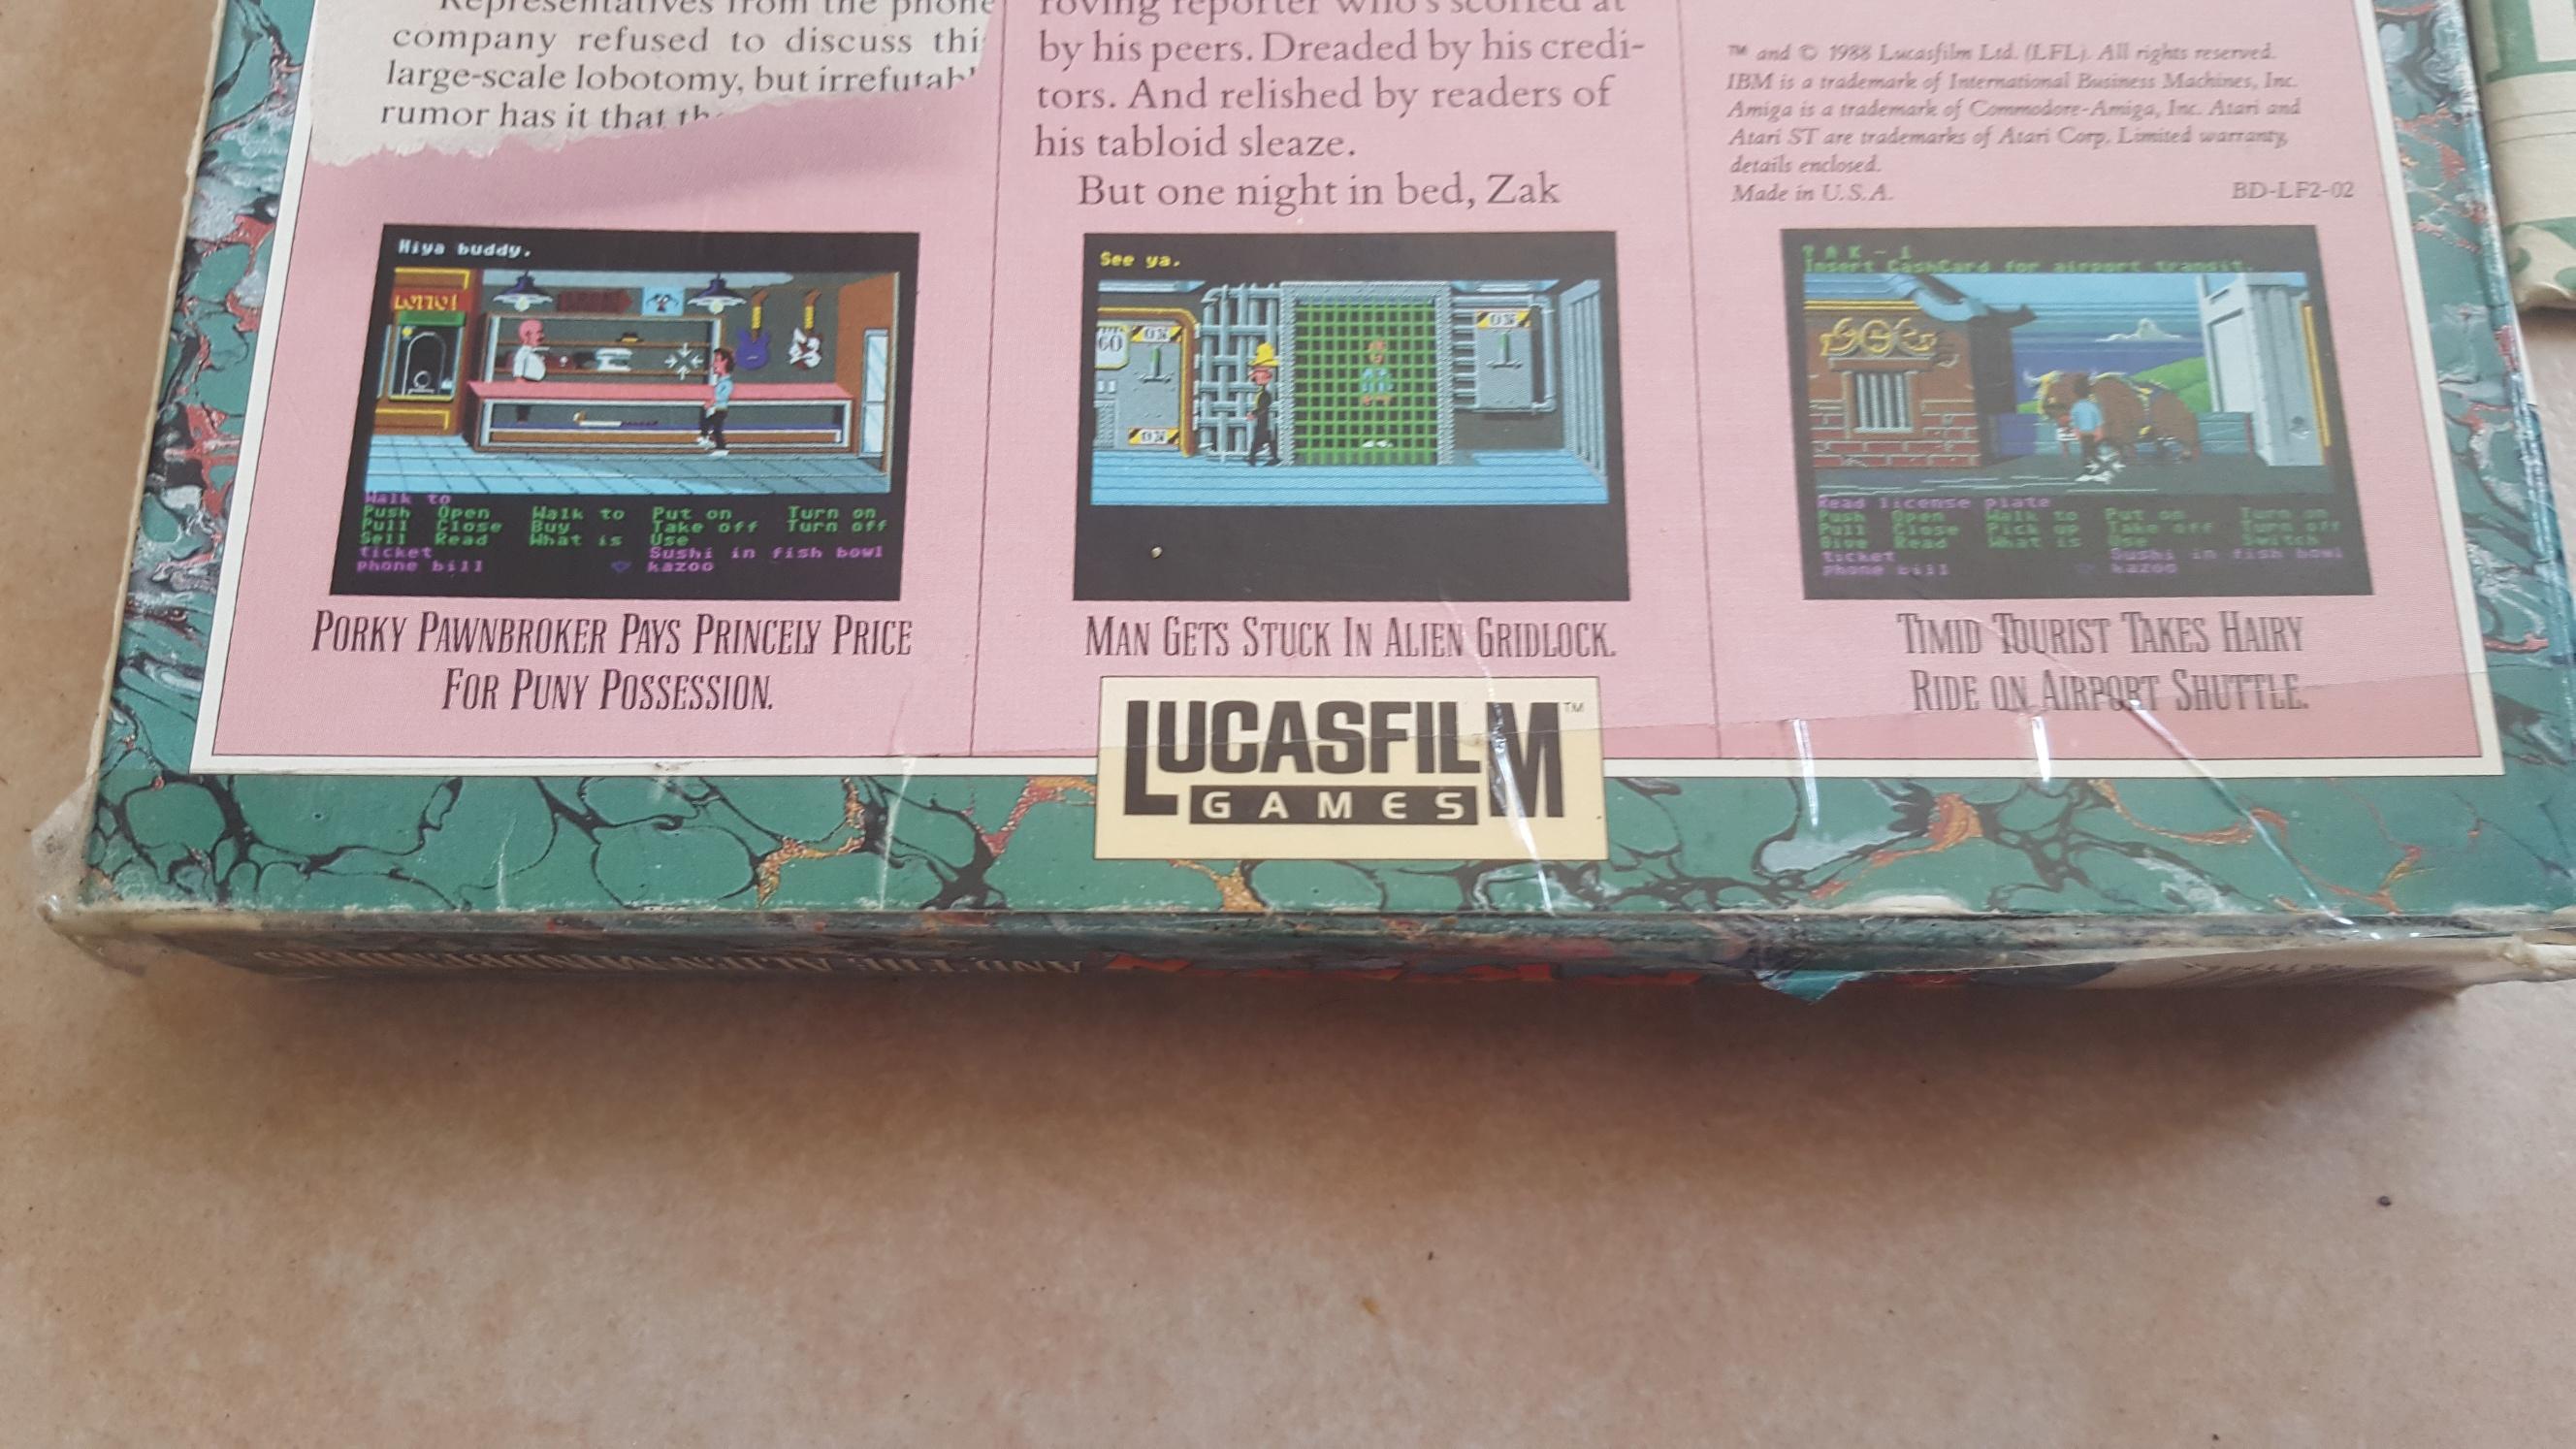 Vente ordinateurs et jeux Atari, Amiga, Amstrad et PC MAJ 20/01 - Page 6 GnEep